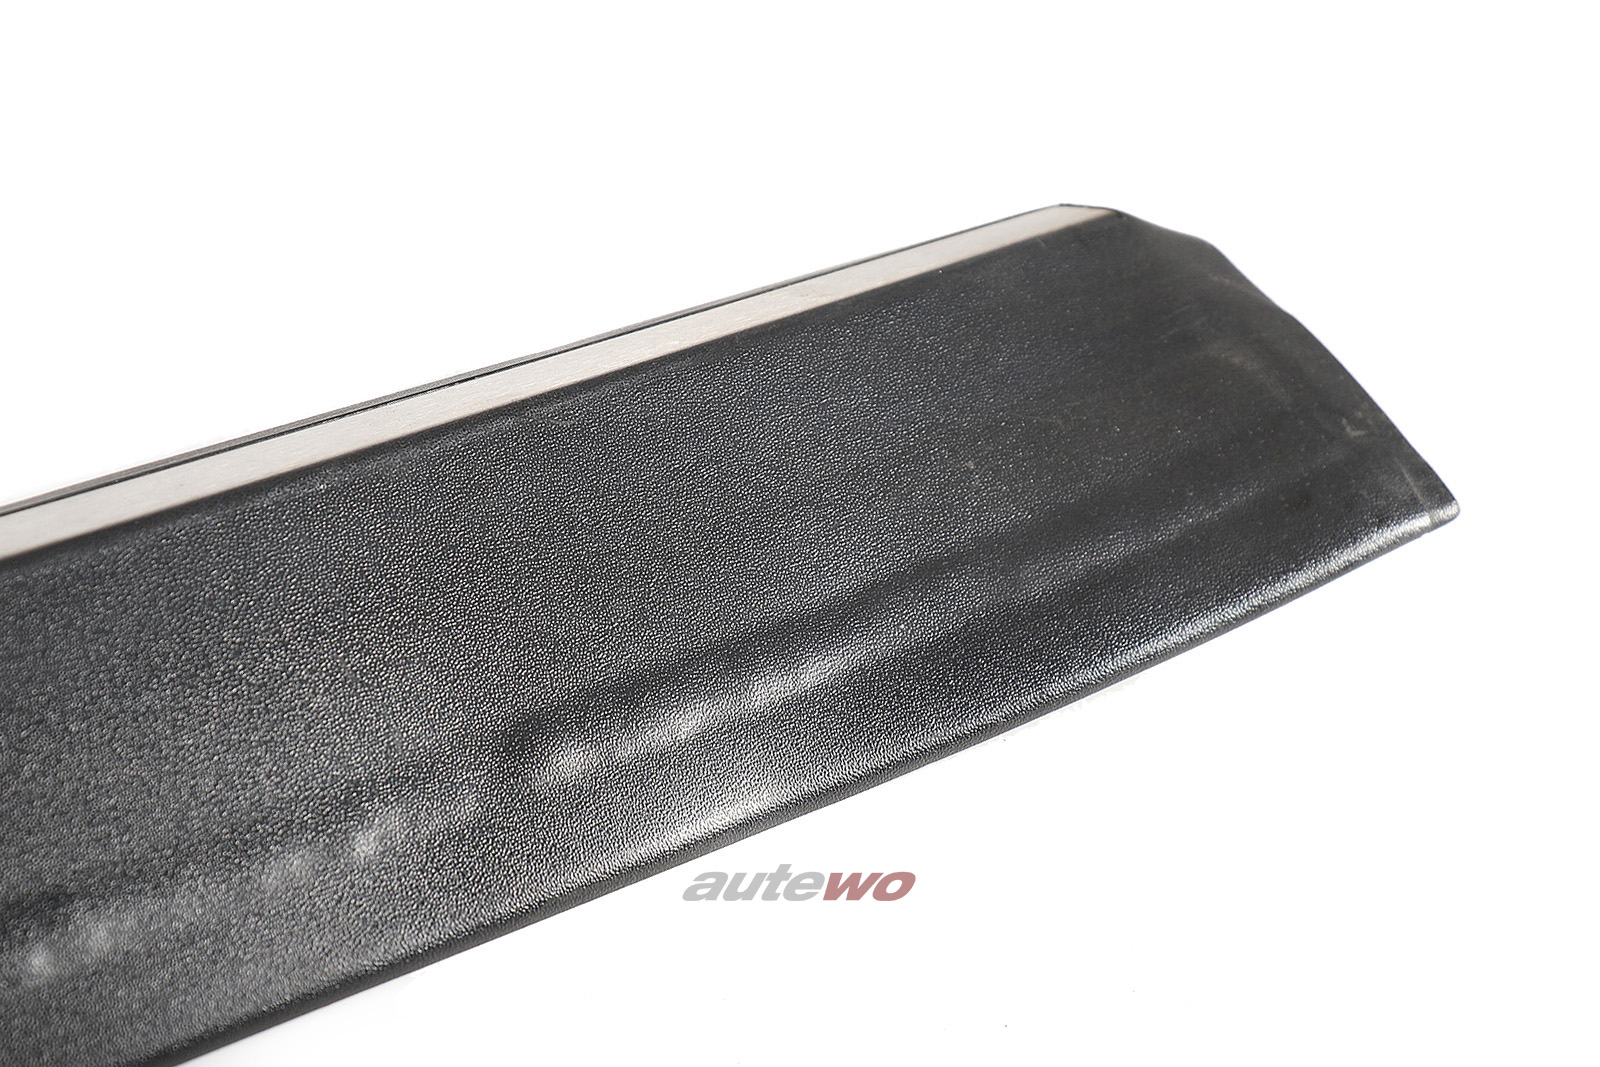 813853968F Audi 90 Typ 81/85 Schutzleiste Tür + Zierleiste Hinten Rechts